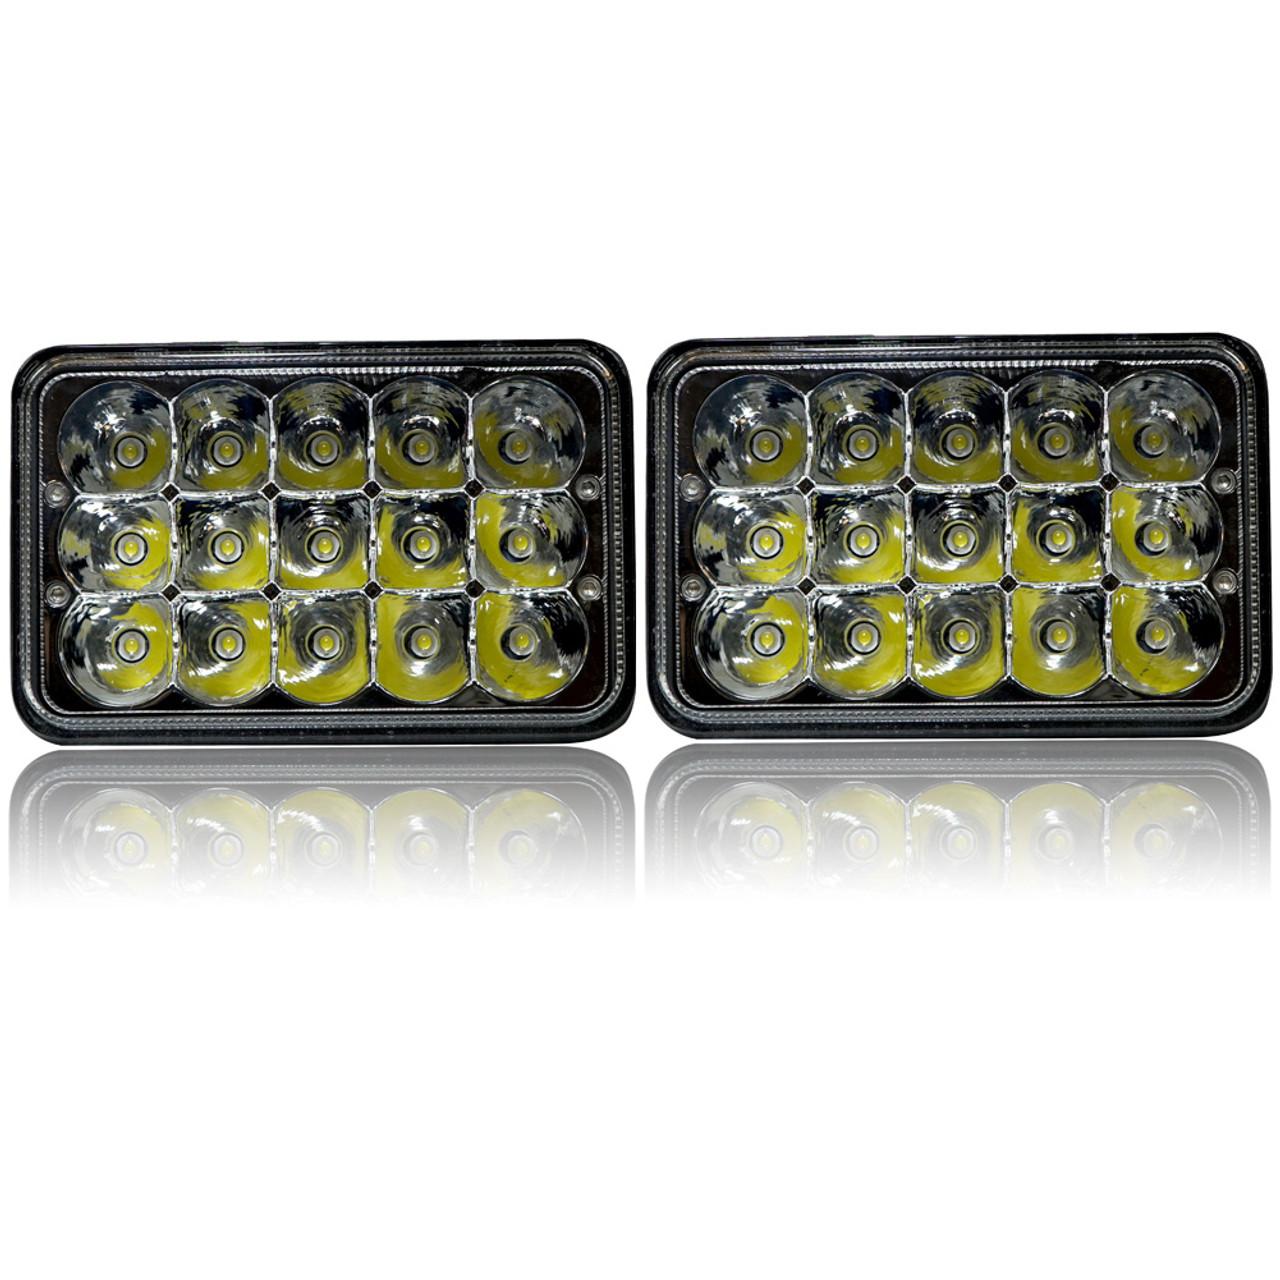 hight resolution of 4x6 led array headlights h4651 h4652 h4656 h4666 h6545 chrome set